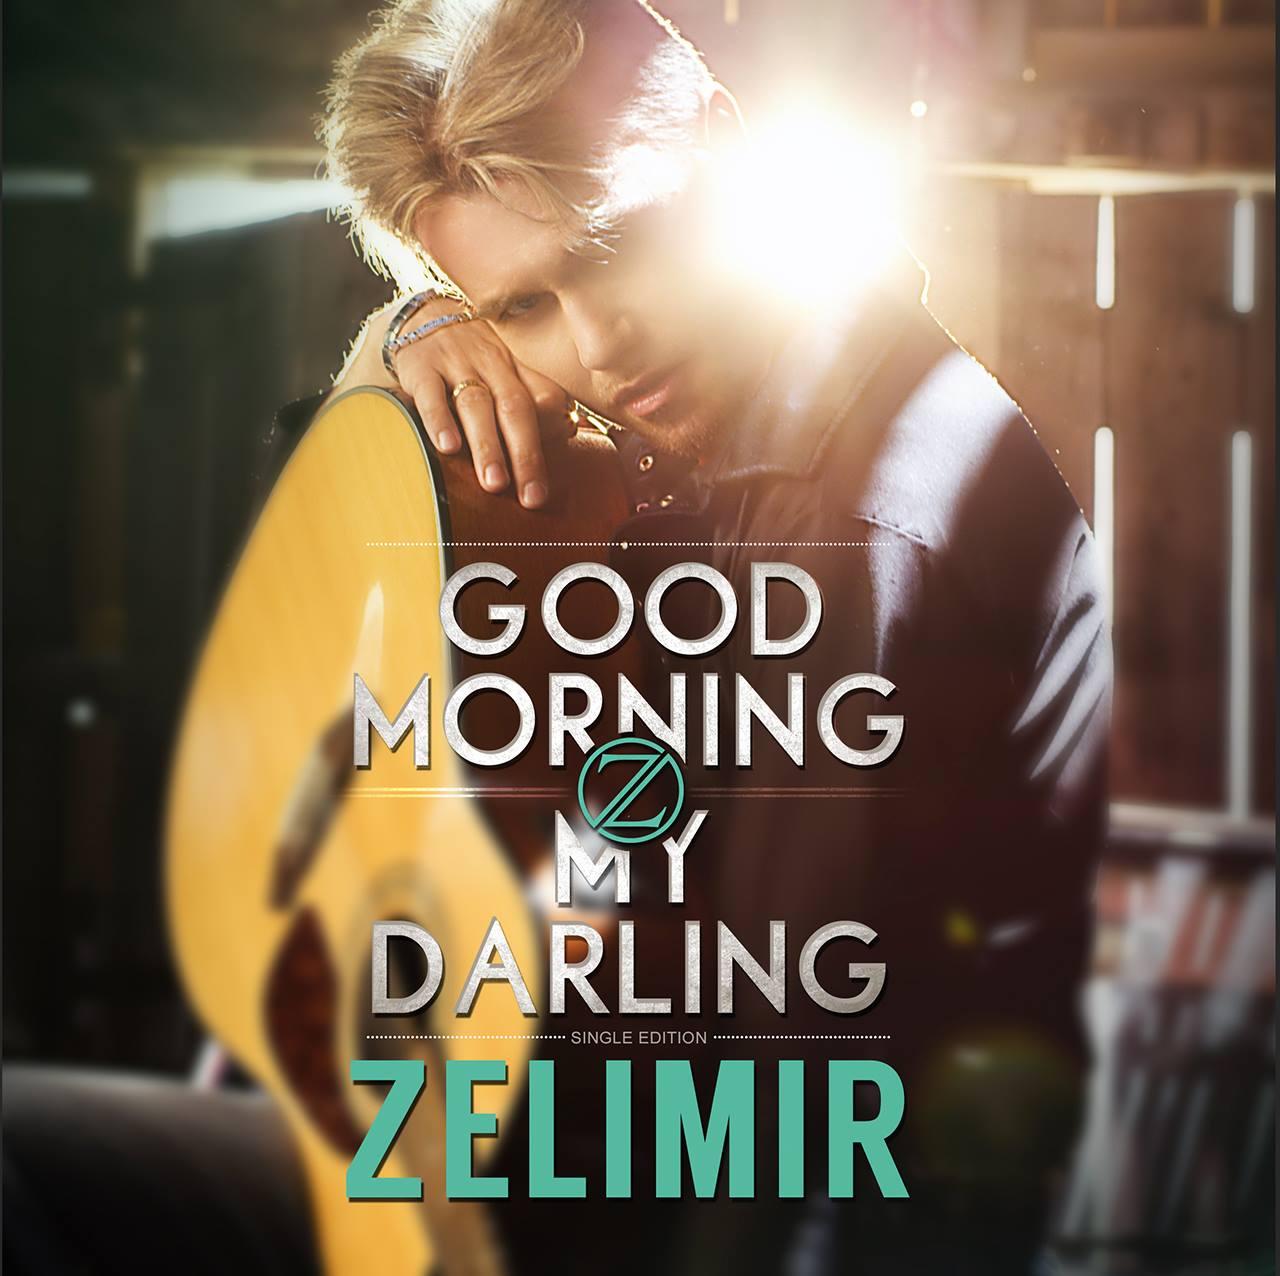 Zelimir - Good Morning My Darling (GMMD)